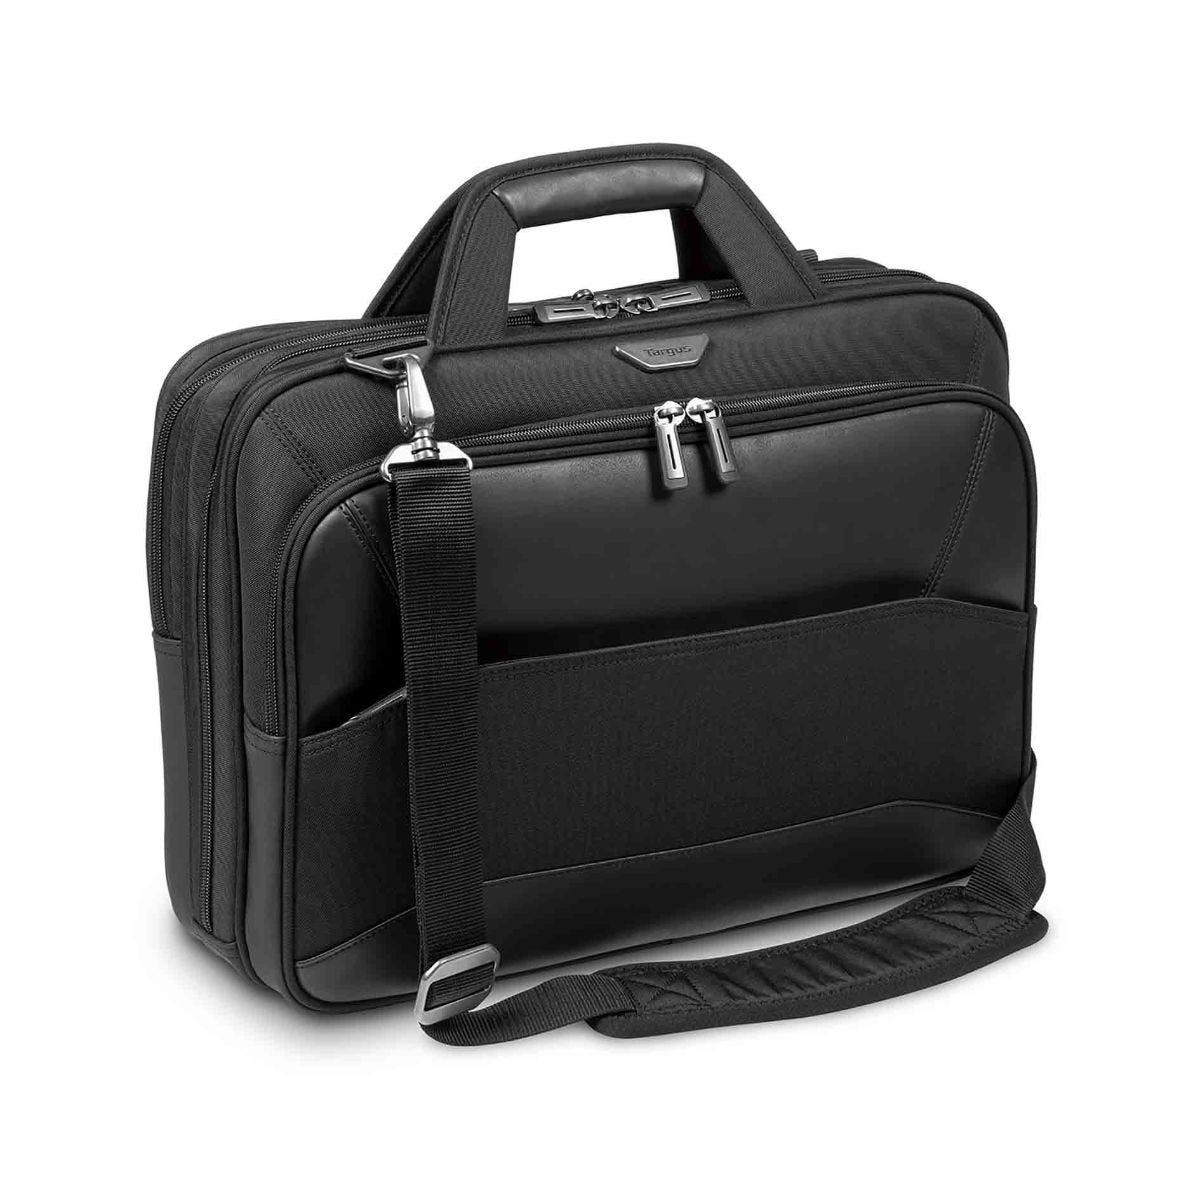 Image of Targus Mobile VIP Topload Laptop Case 15.6 Inch, Black